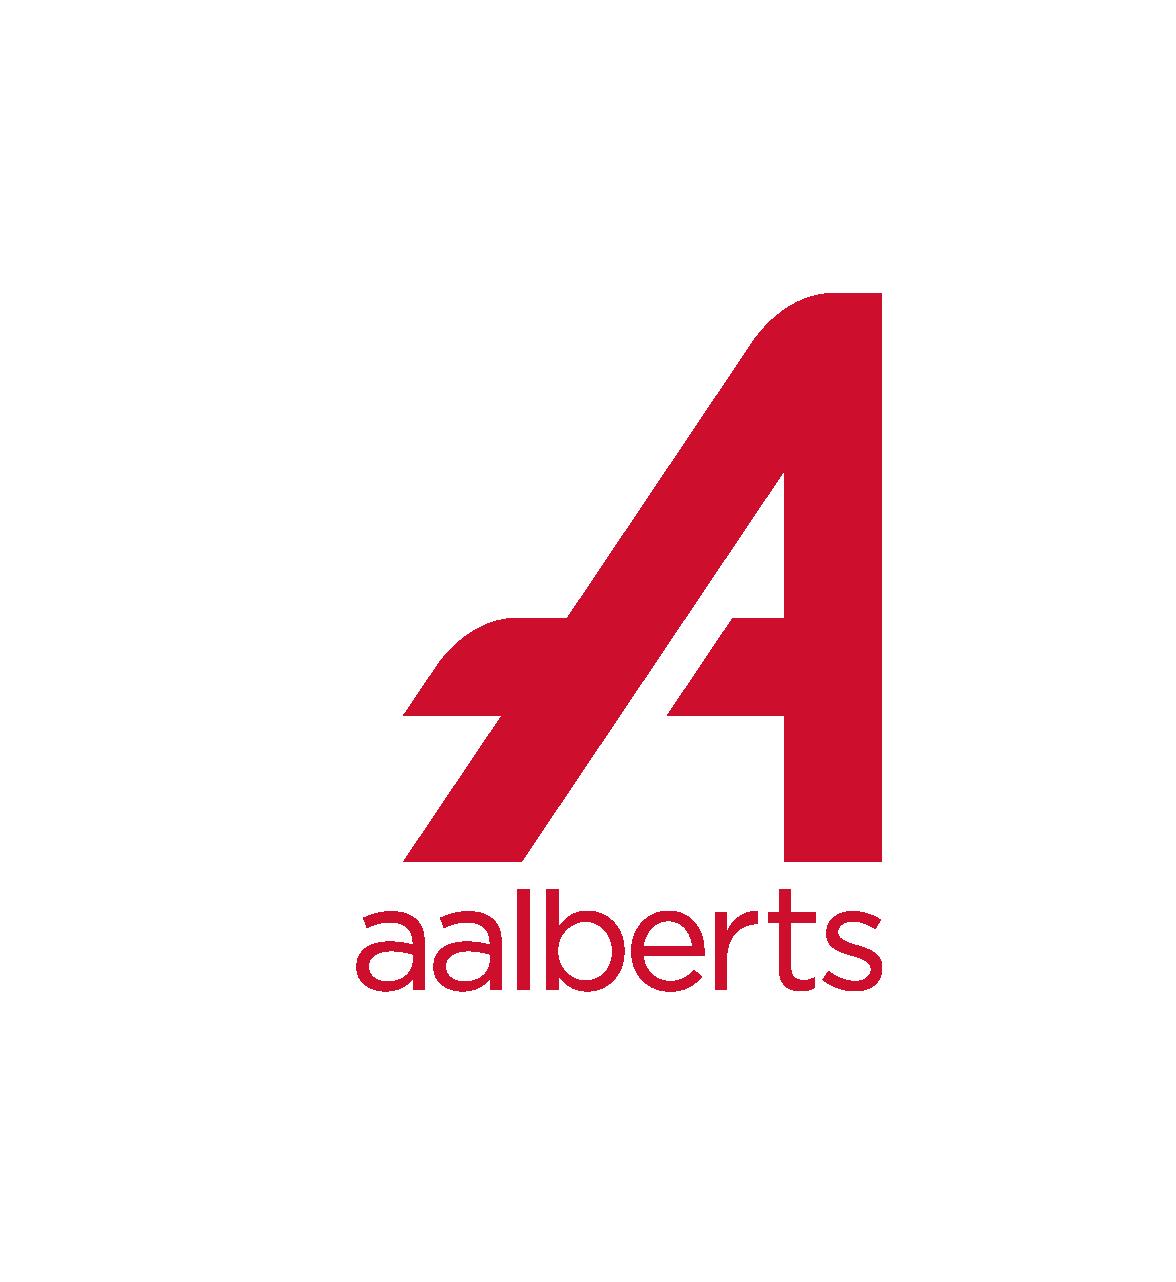 Aalberts Logo